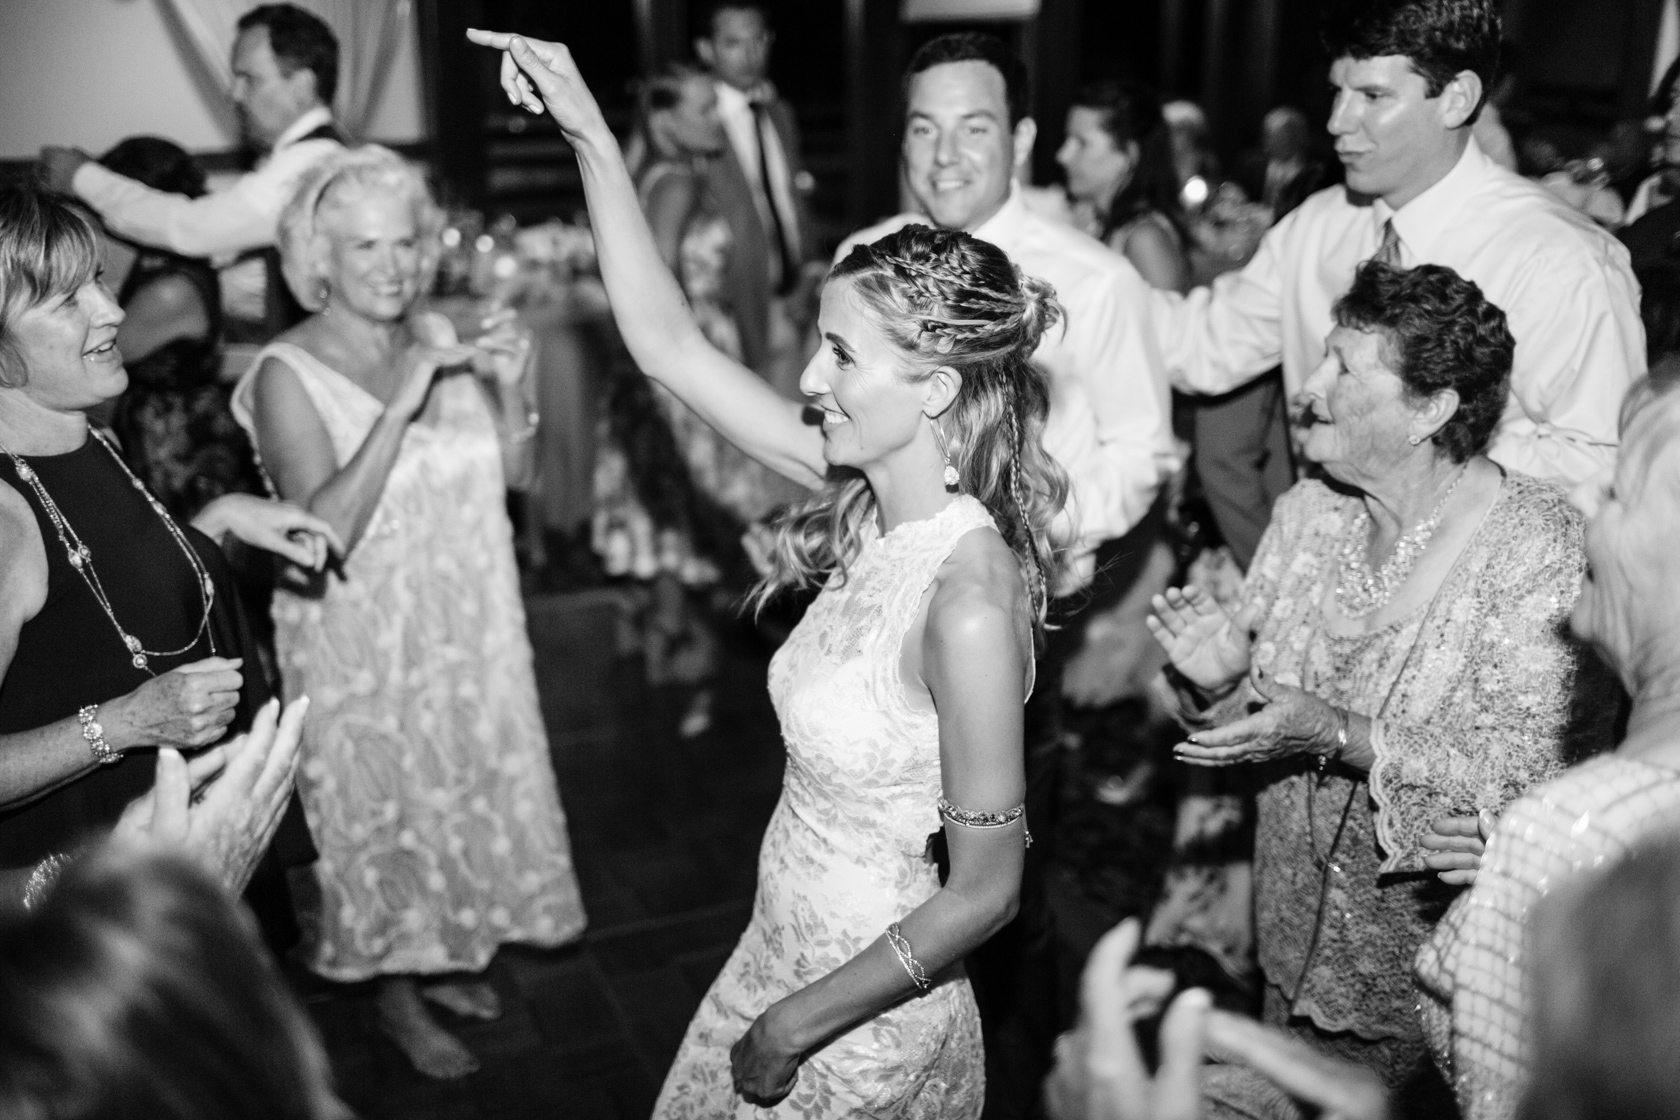 The_Lodge_at_Torrey_Pines_Wedding_120.jpg